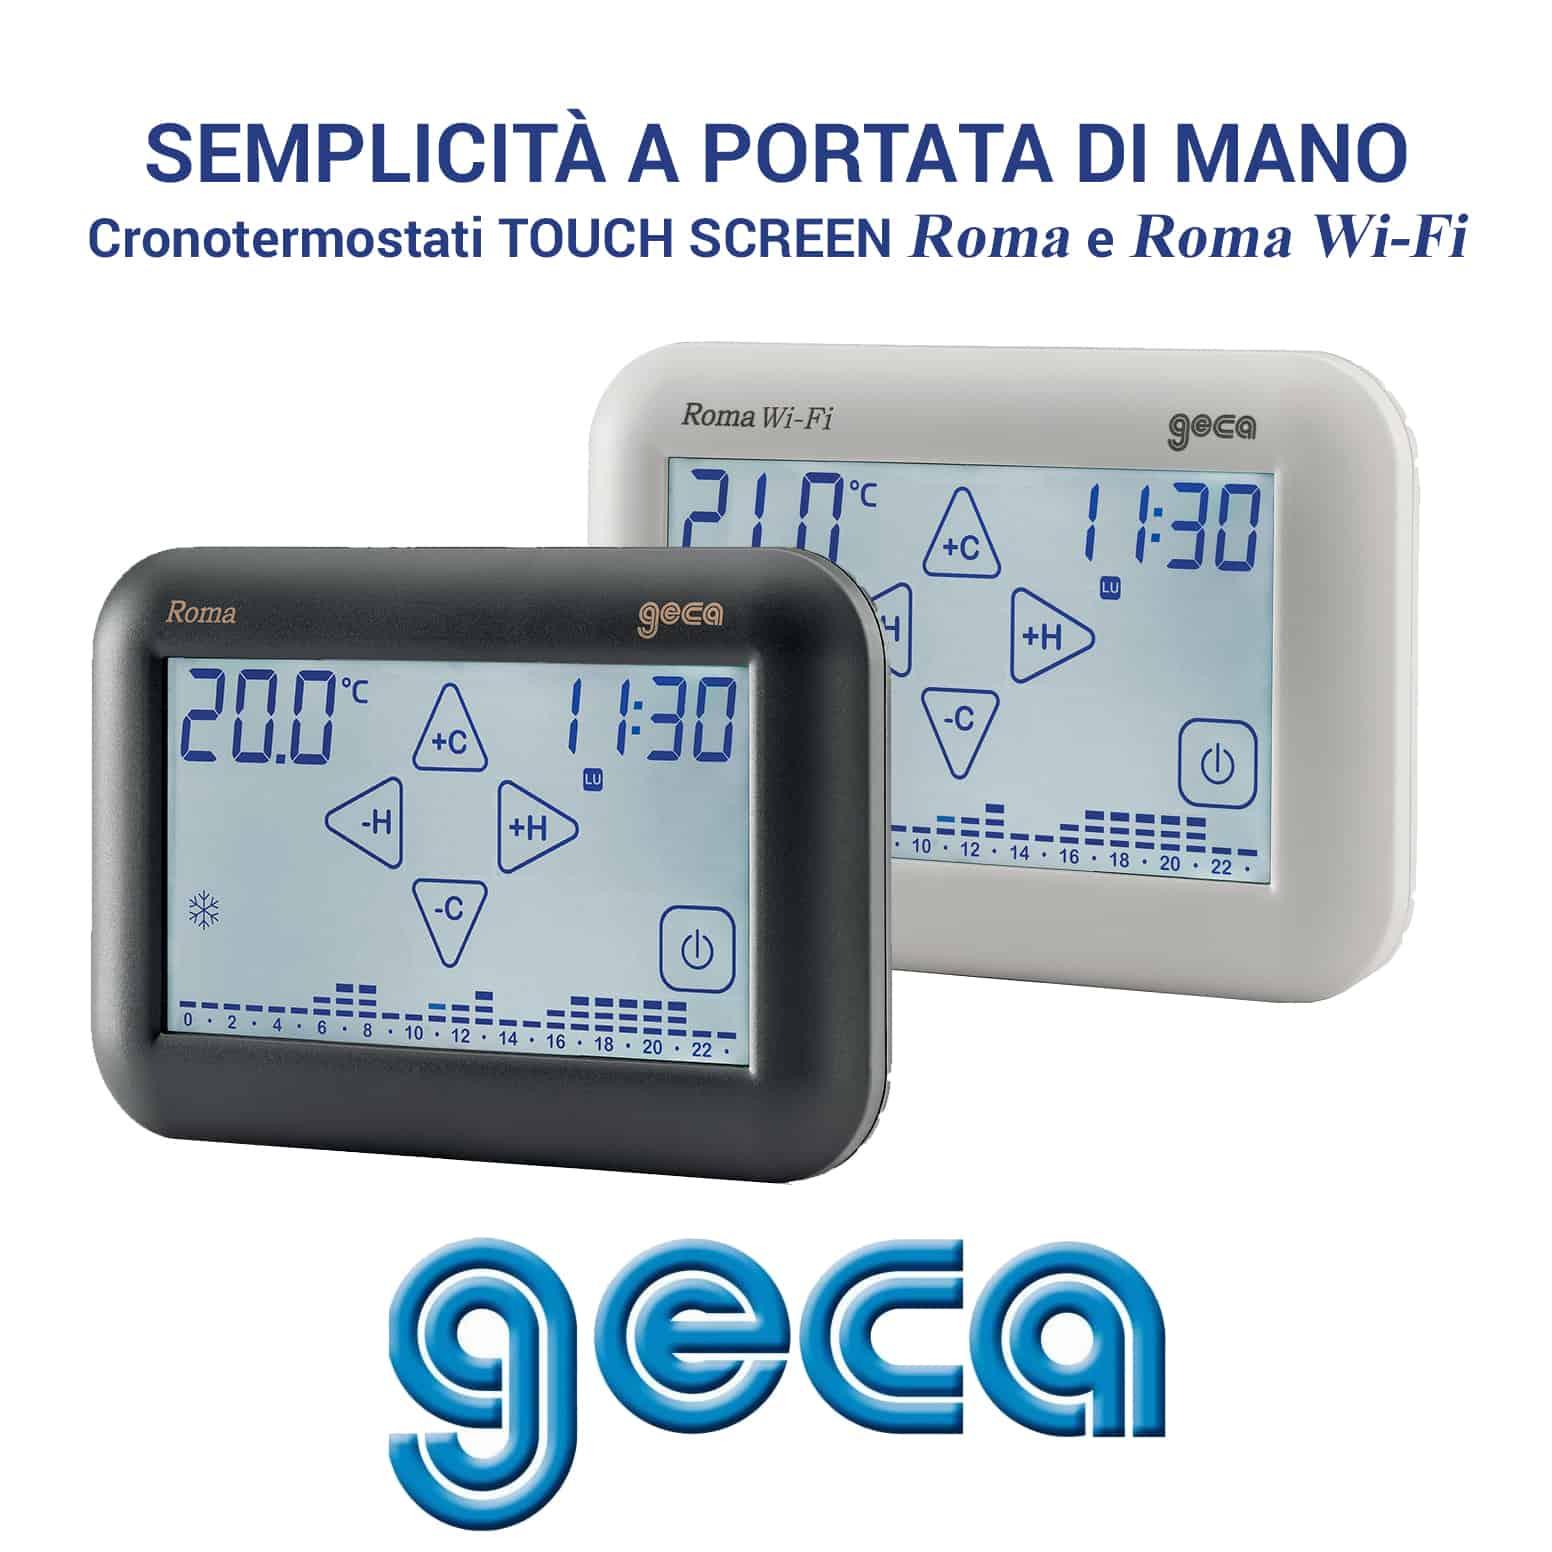 Cronotermostati GECA Roma e Roma Wi-Fi: affidabili e touch screen!